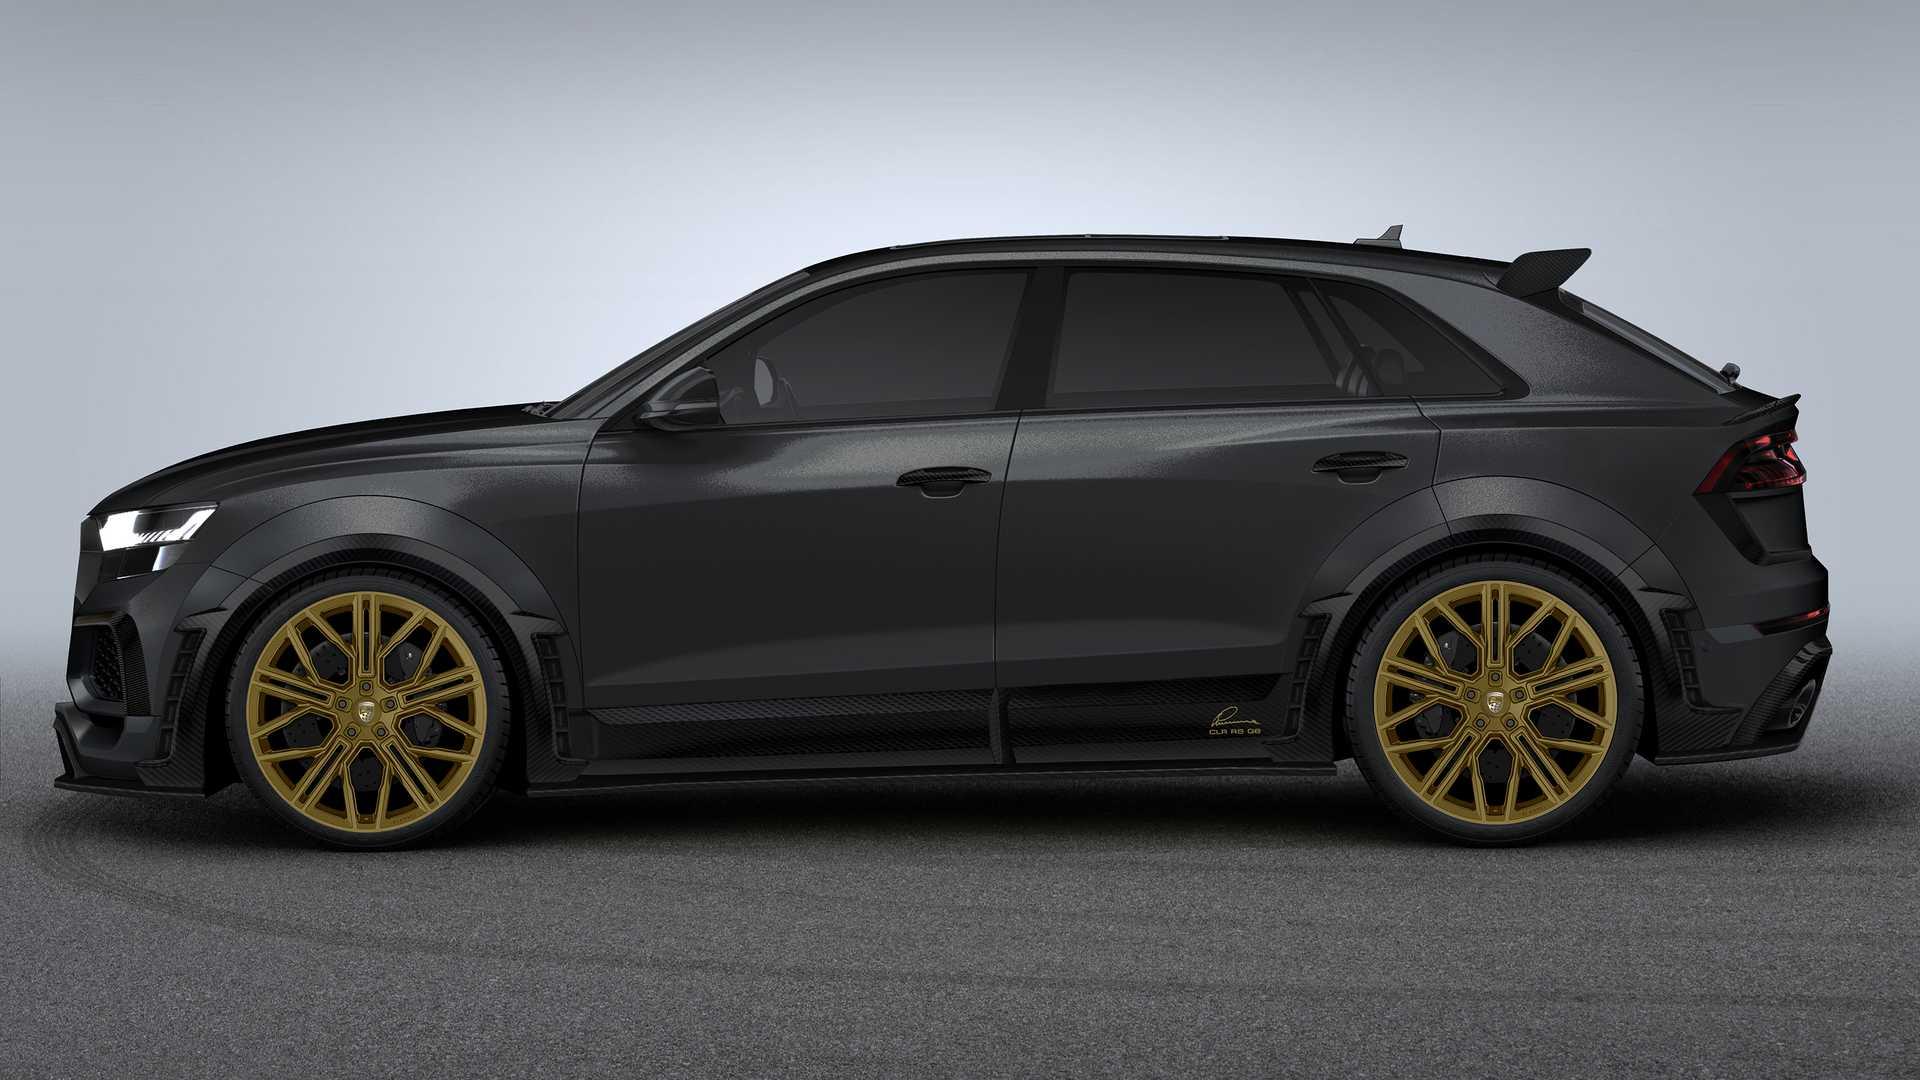 Audi-RS-Q8-CLR-8-RS-By-Lumma-Design-12